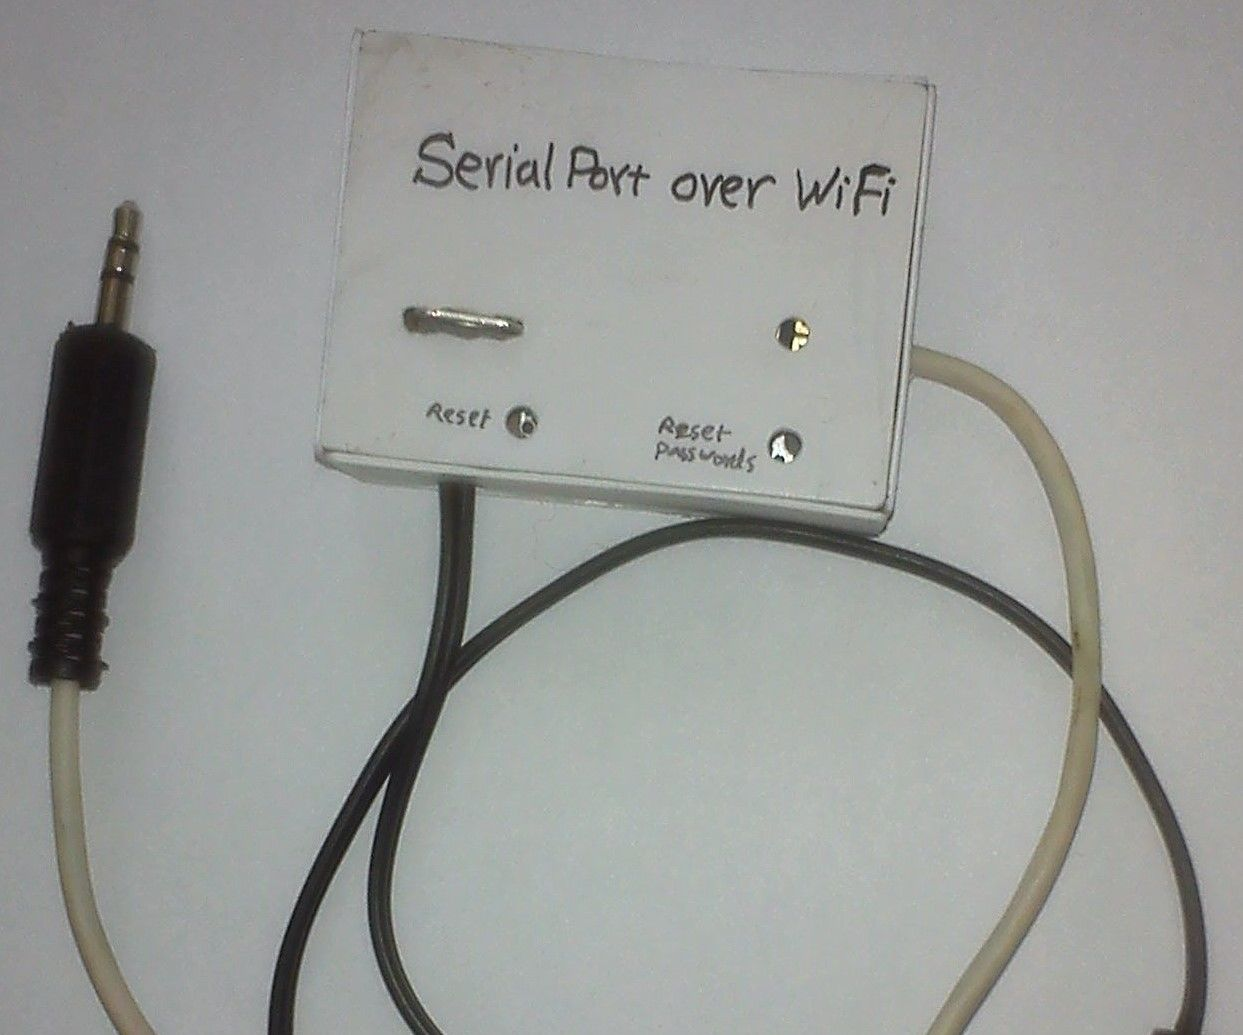 Serial Port Over WiFi: 10 Steps